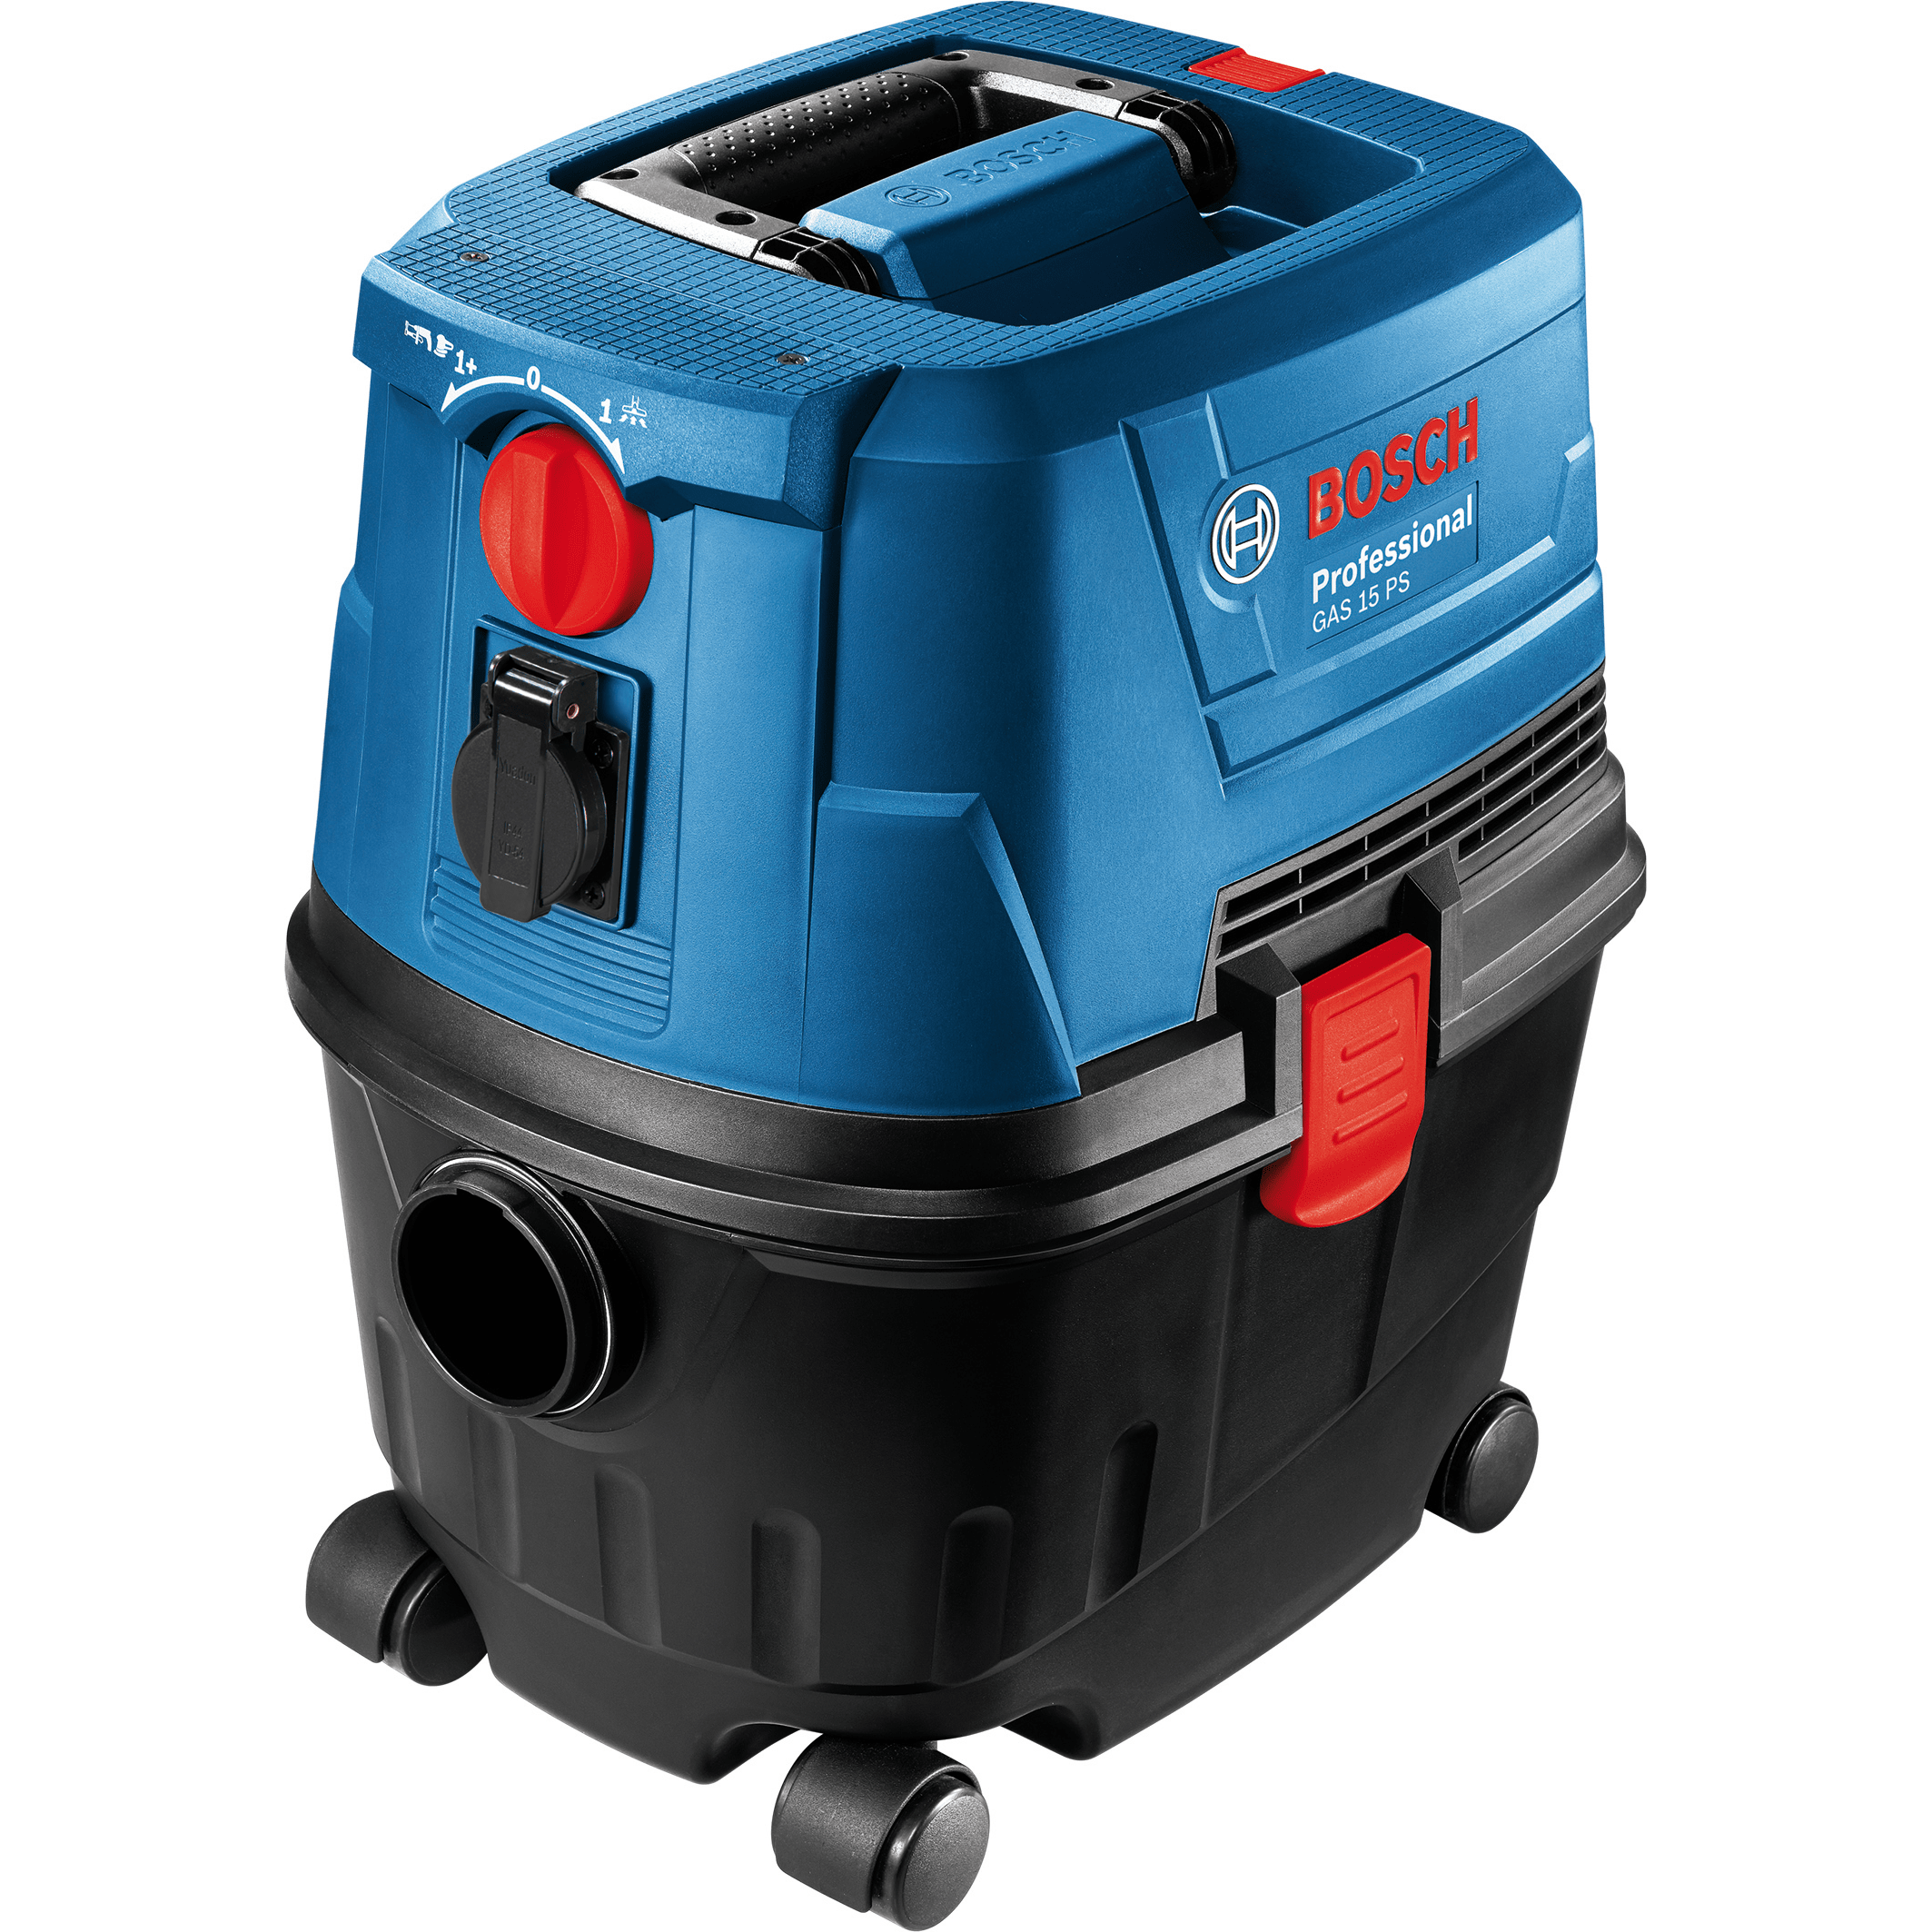 Aspirator universal Bosch GAS 15 PS Professional, 1100W, 10L, 360 x 440 mm, 3 m imagine 2021 mathaus